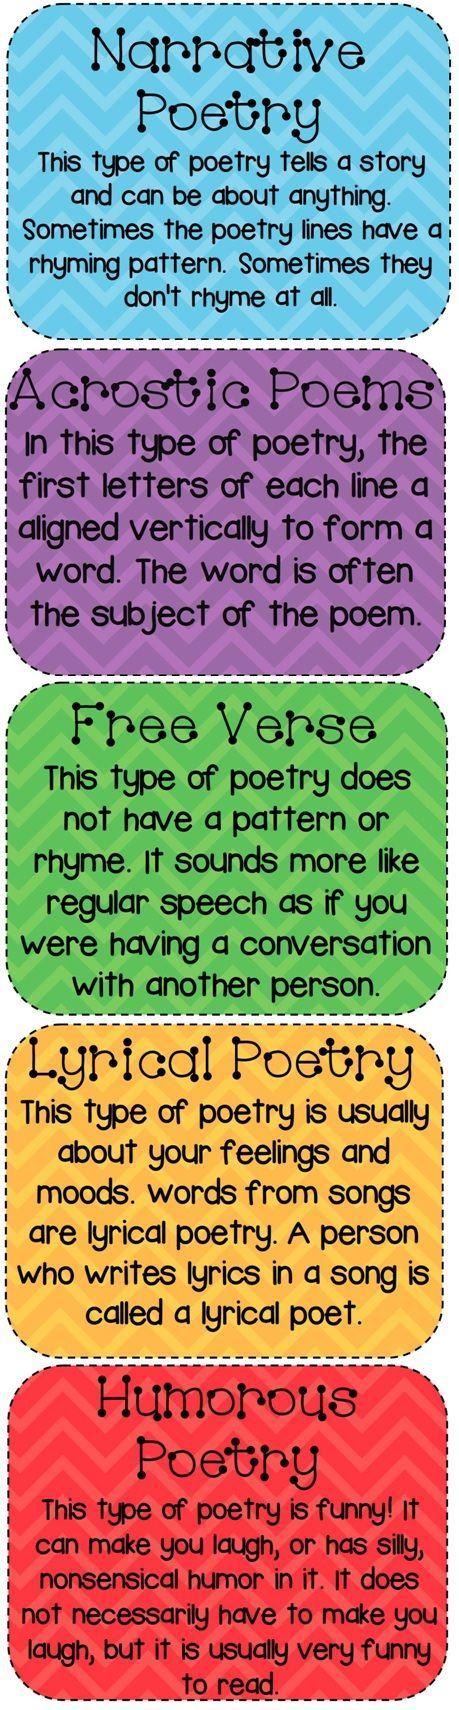 Chevron design poetry posters freebie! more writing ideas here: https://goo.gl/ygR4F8